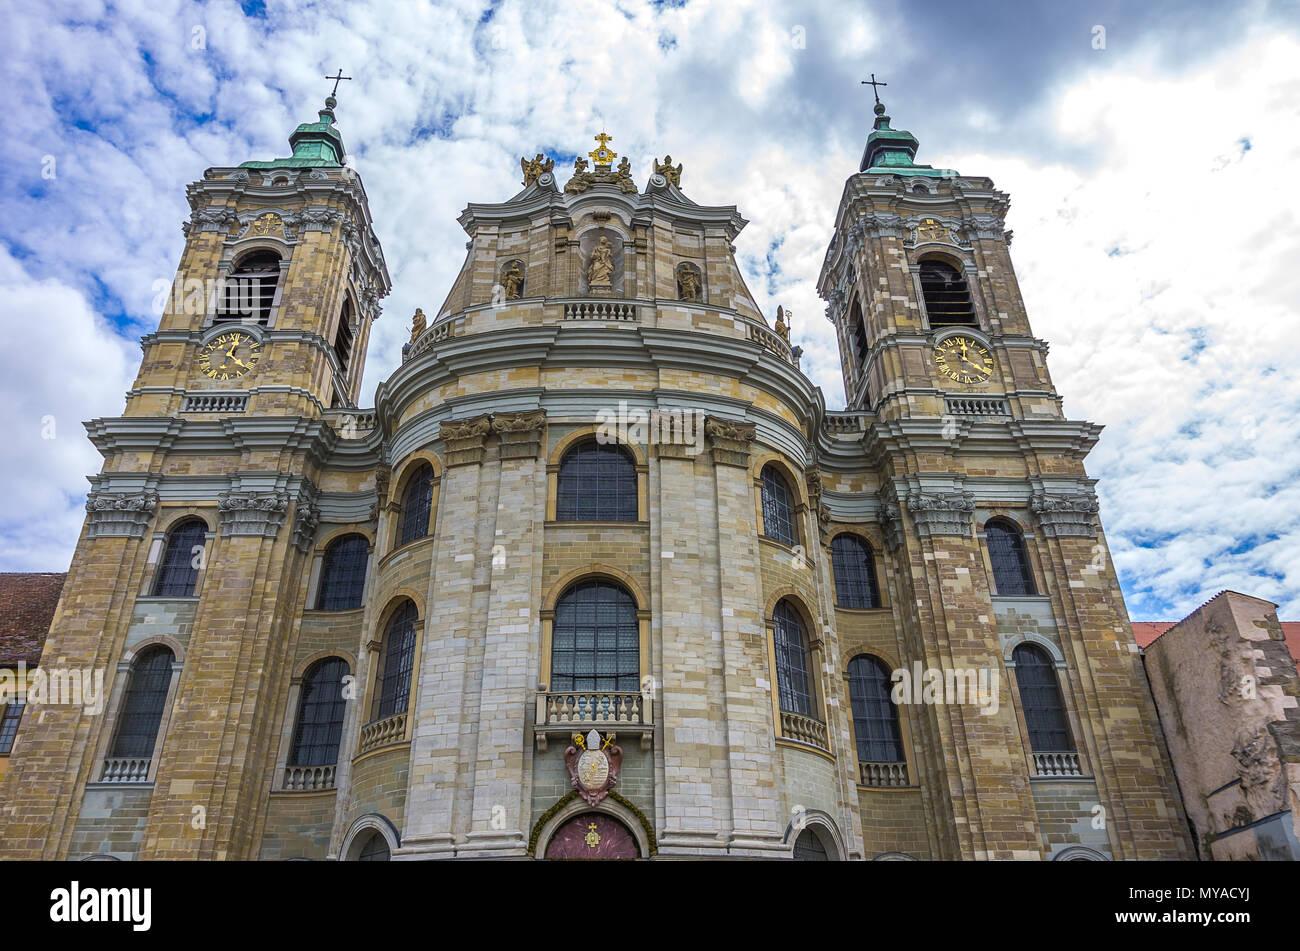 Basilika St. Martin, Weingarten, Baden-Württemberg, Deutschland. Stockbild